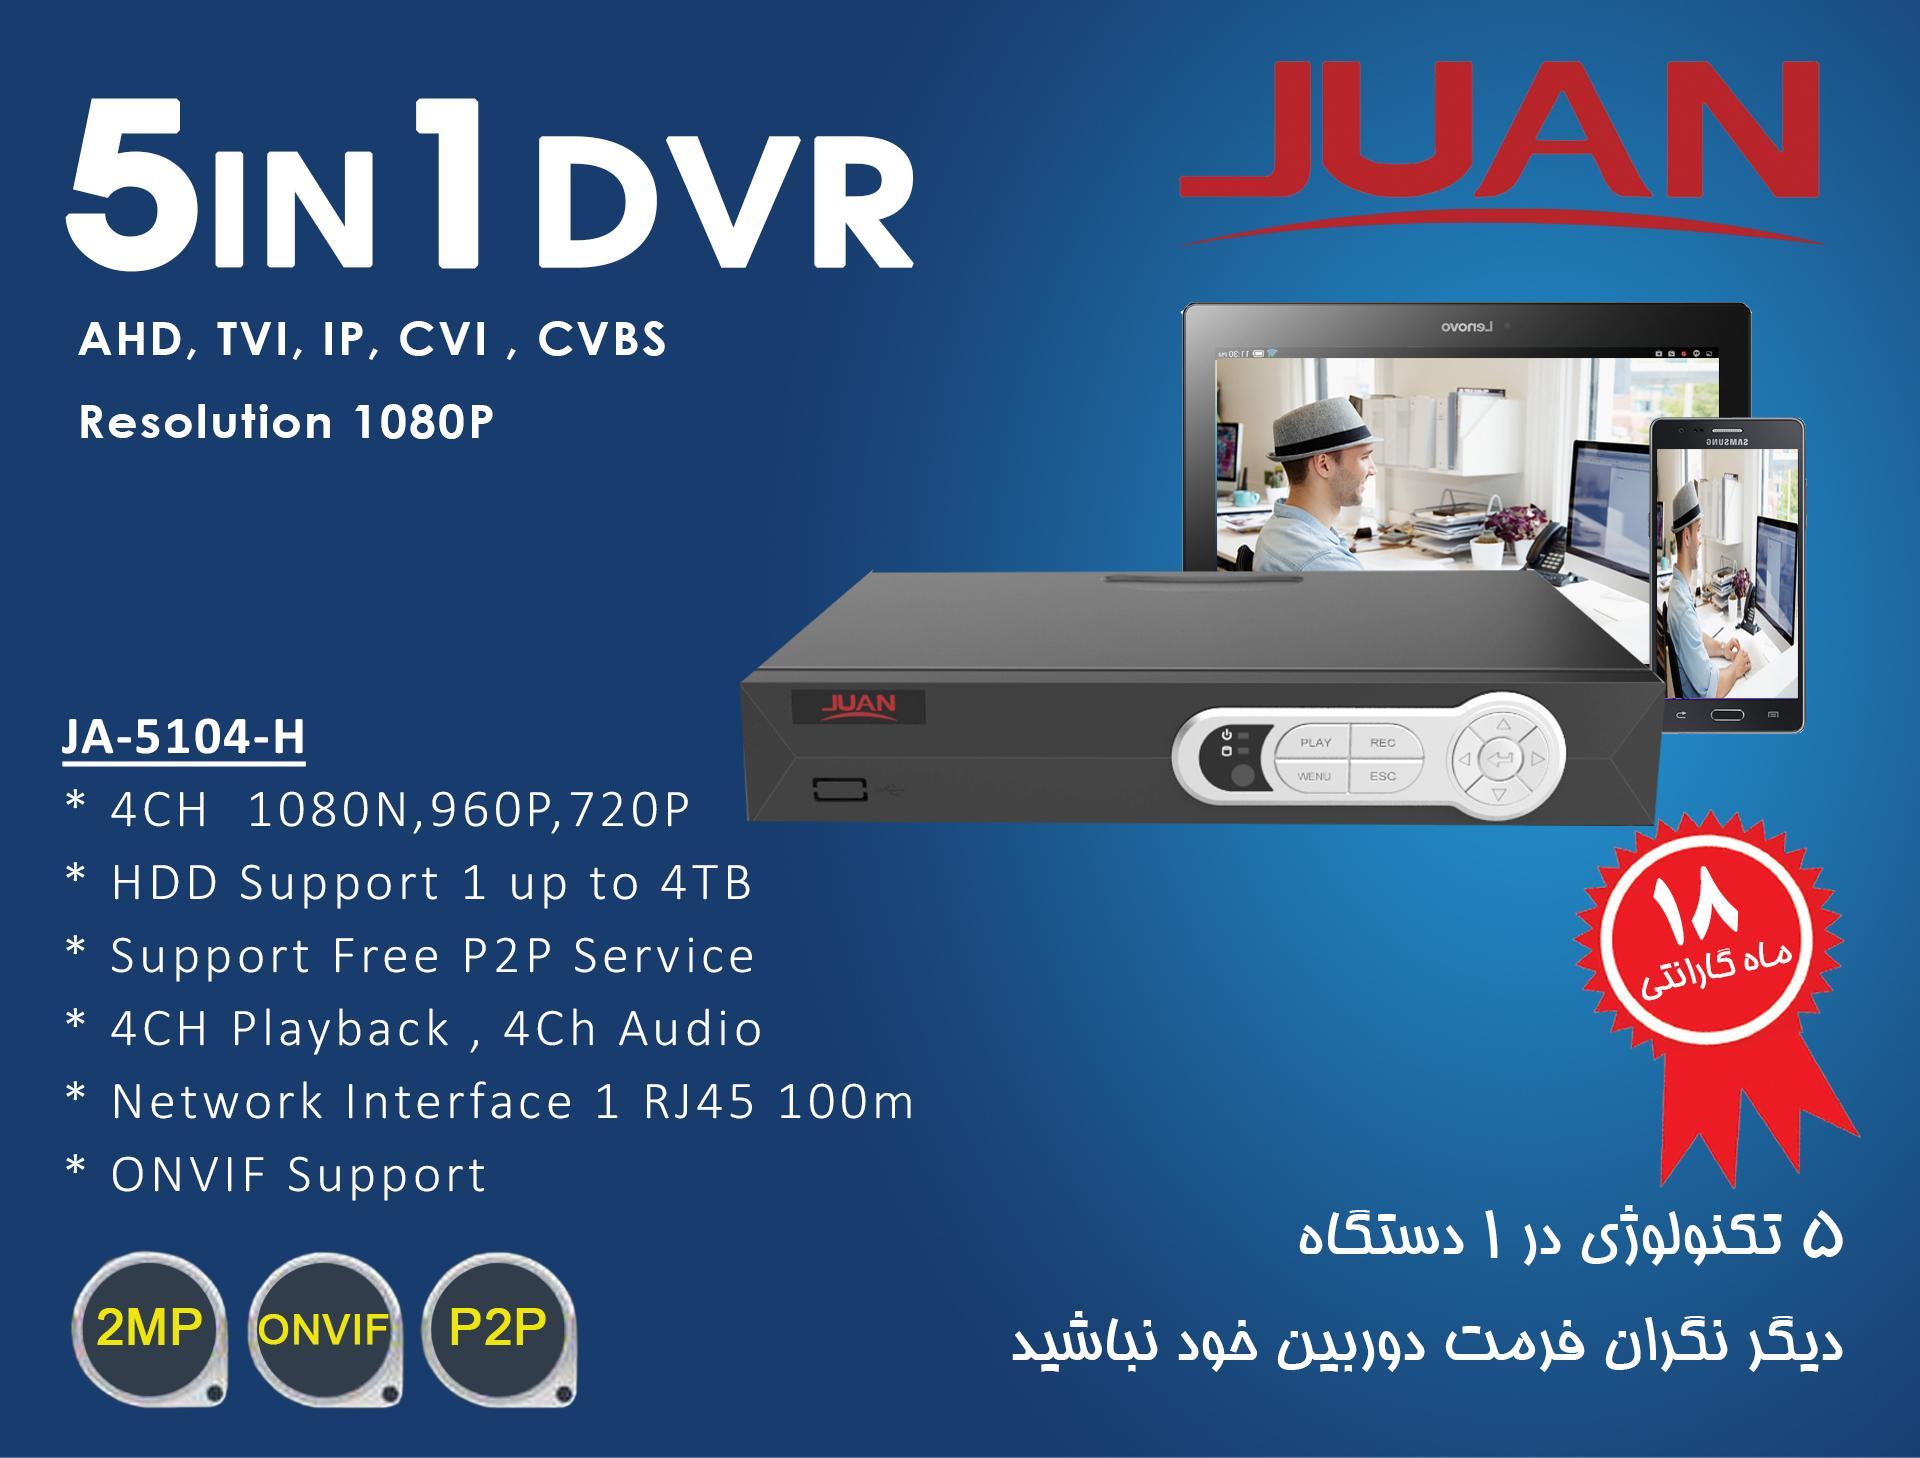 دستگاه ضبط تصاویر 5in1 برند JUAN